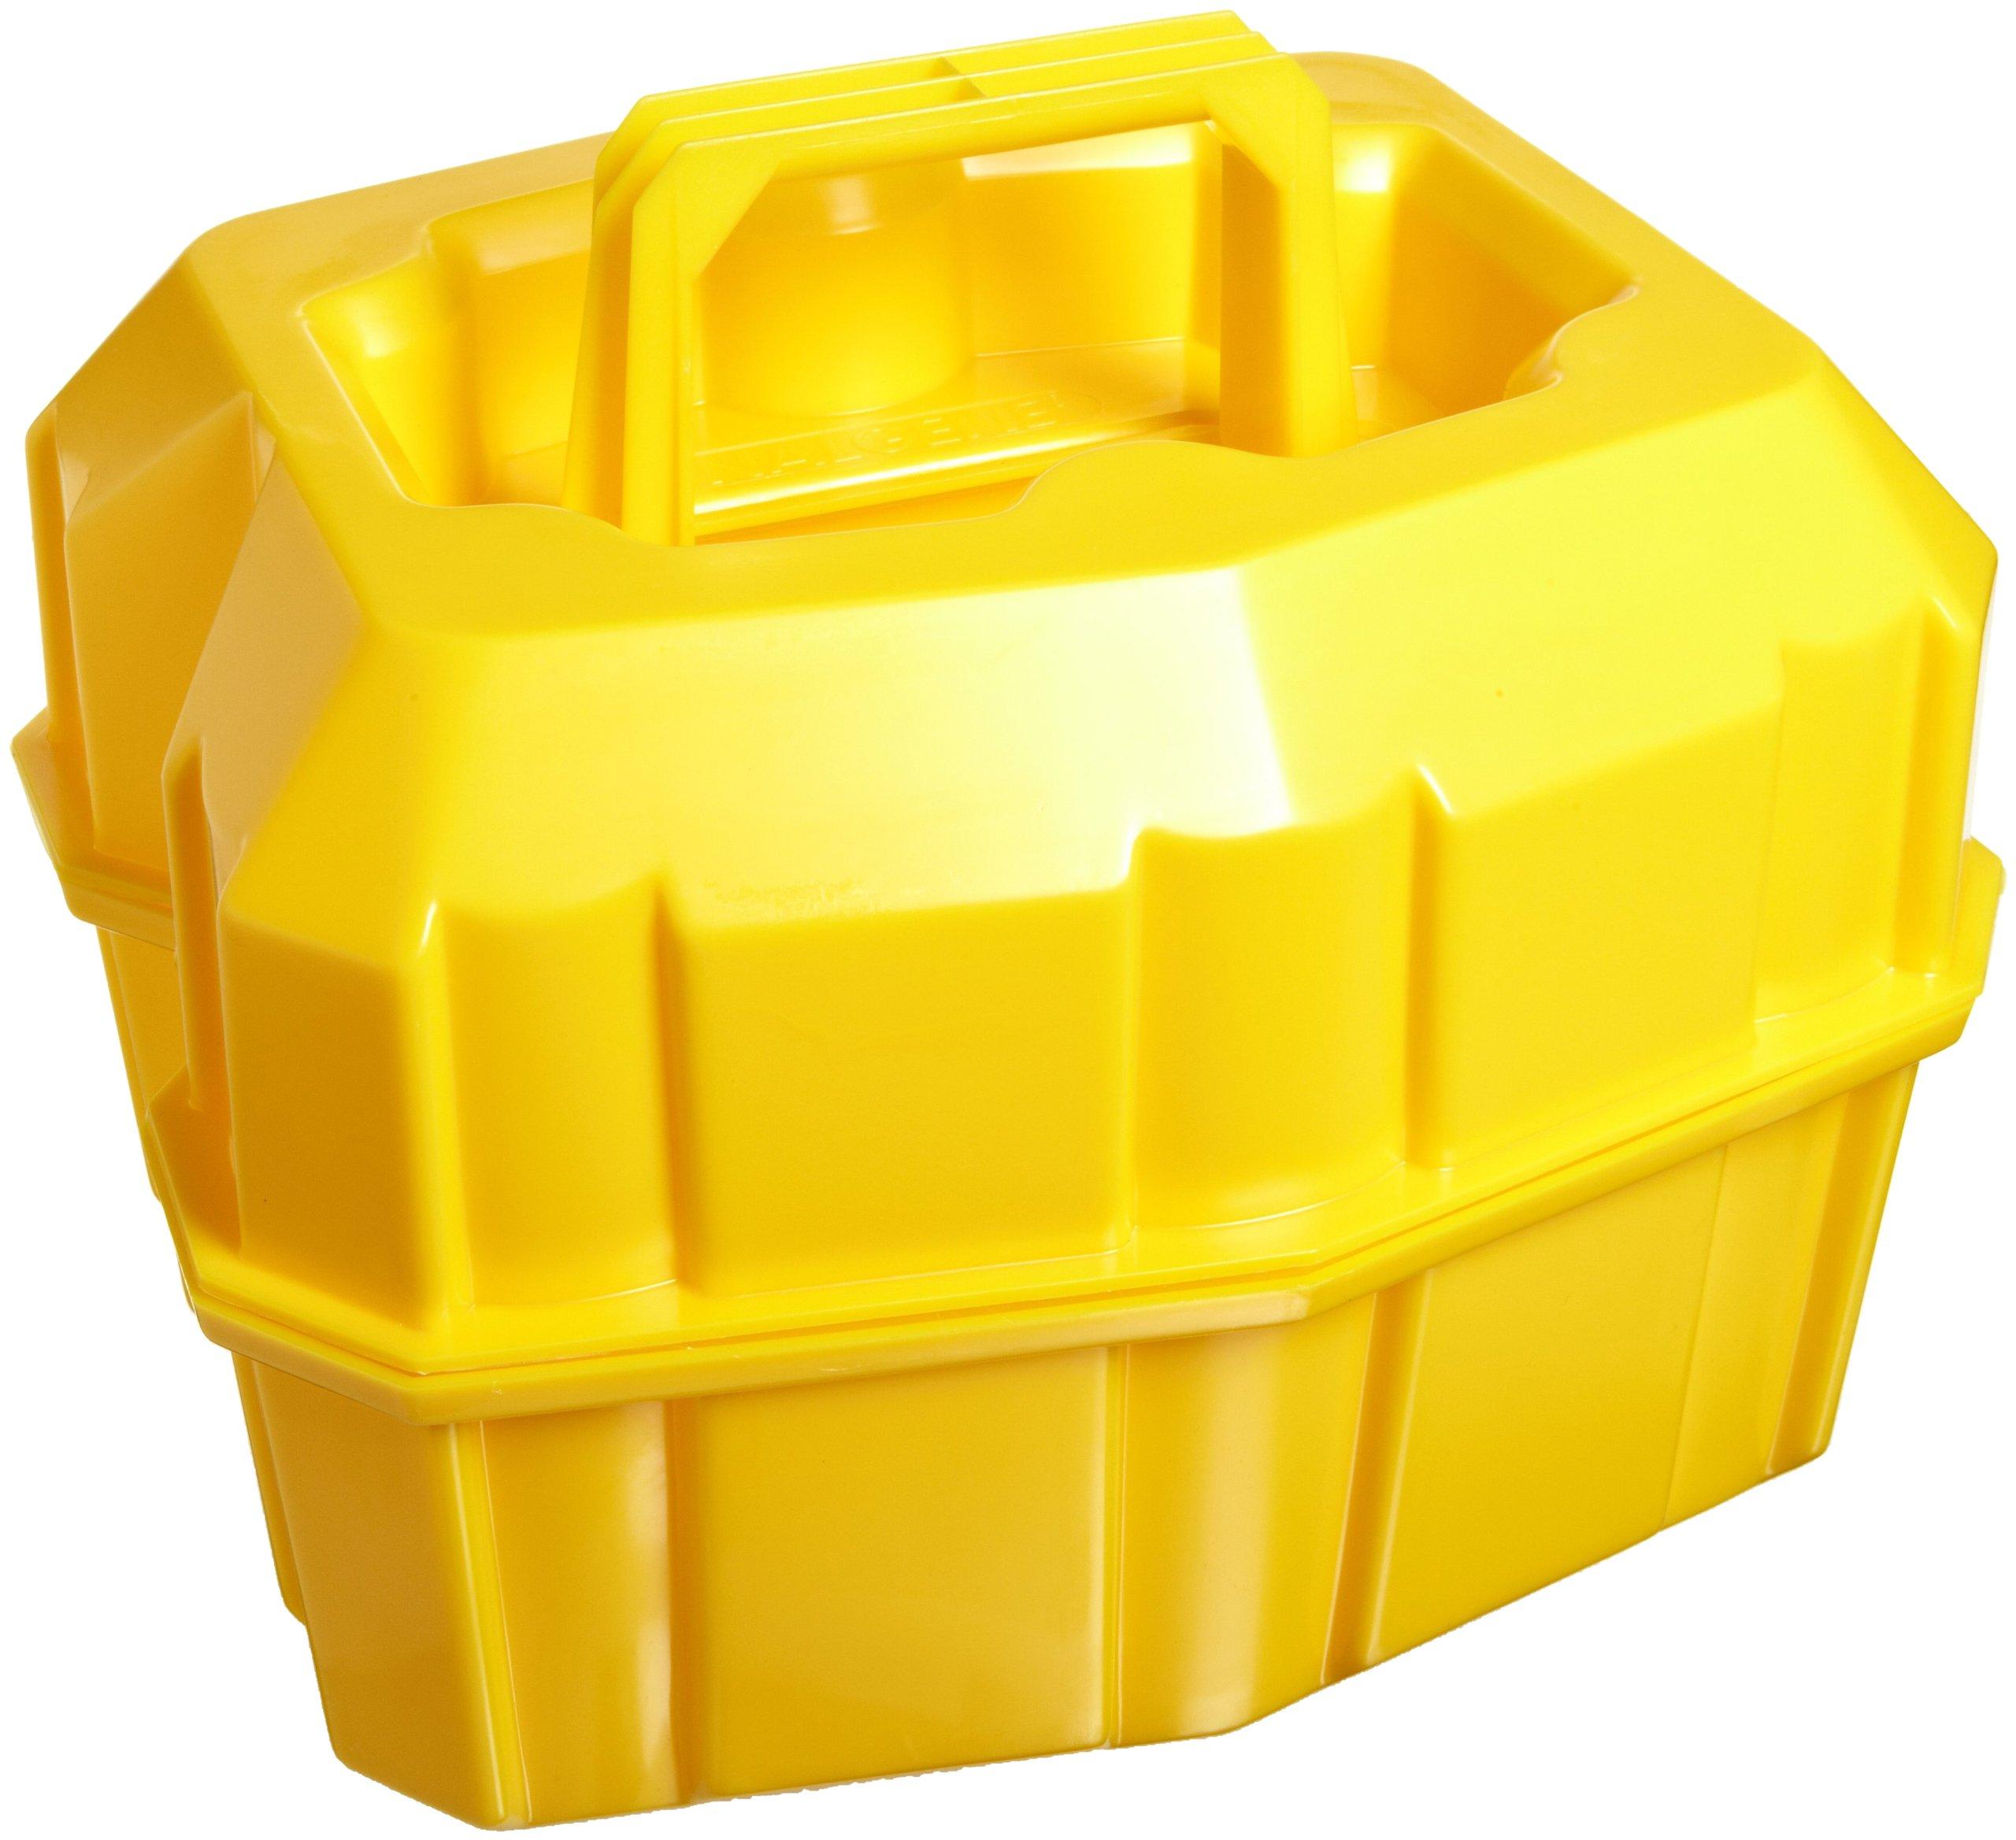 Nalgene 6505-0010 Low-Density Polyethylene (LDPE) Safety Half-Liter Bottle Carrier, 6-Place, Stackable